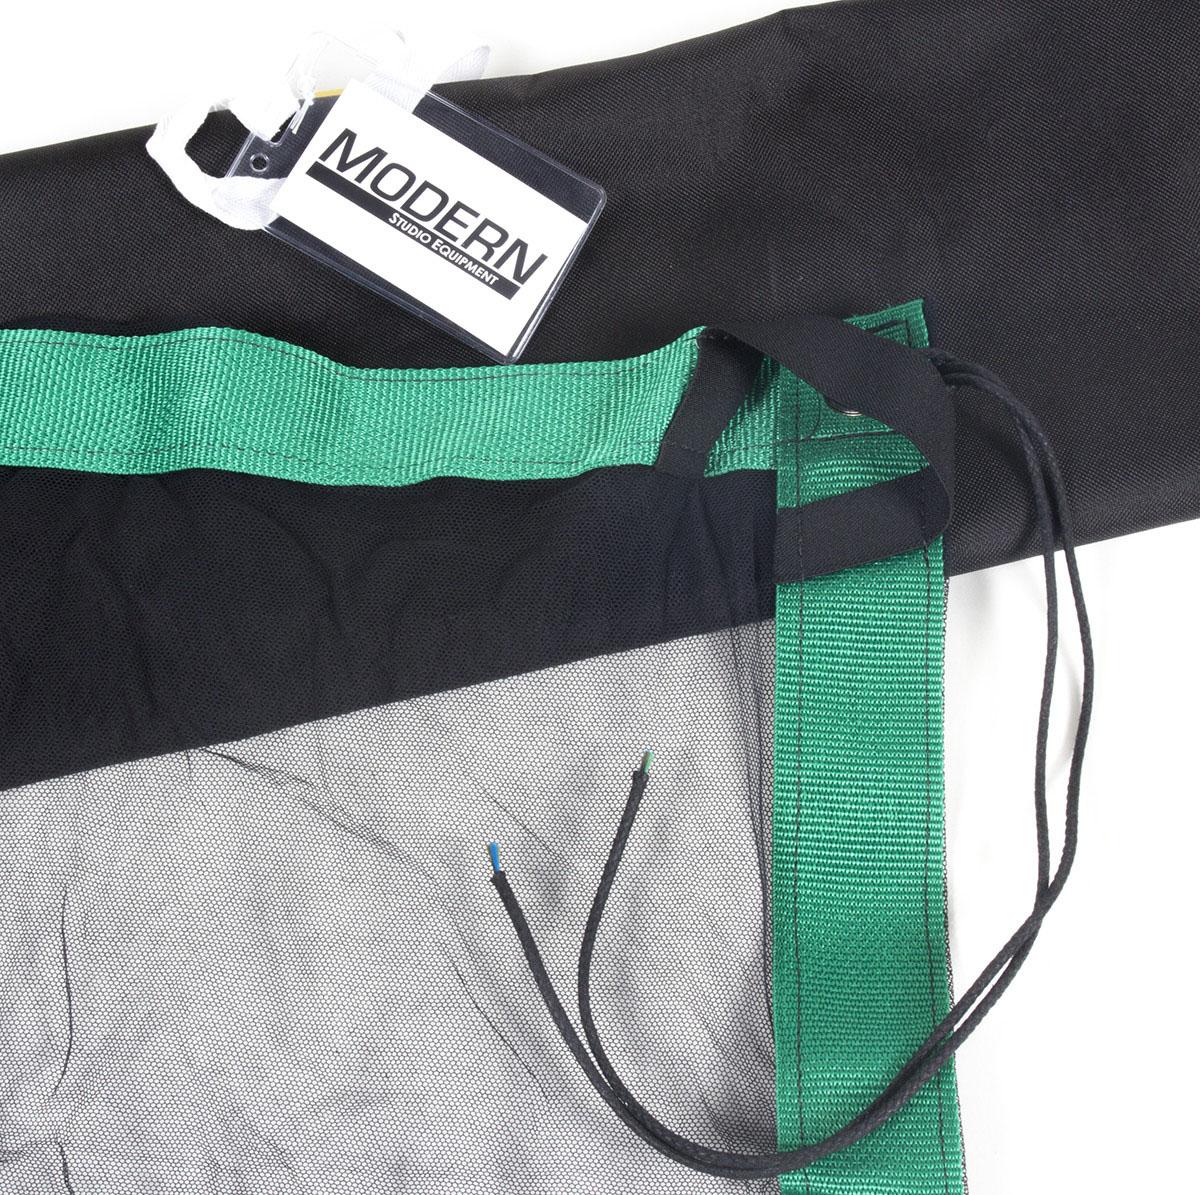 modern-studio-8x8-single-scrim-net-black-with-bag-14.jpg